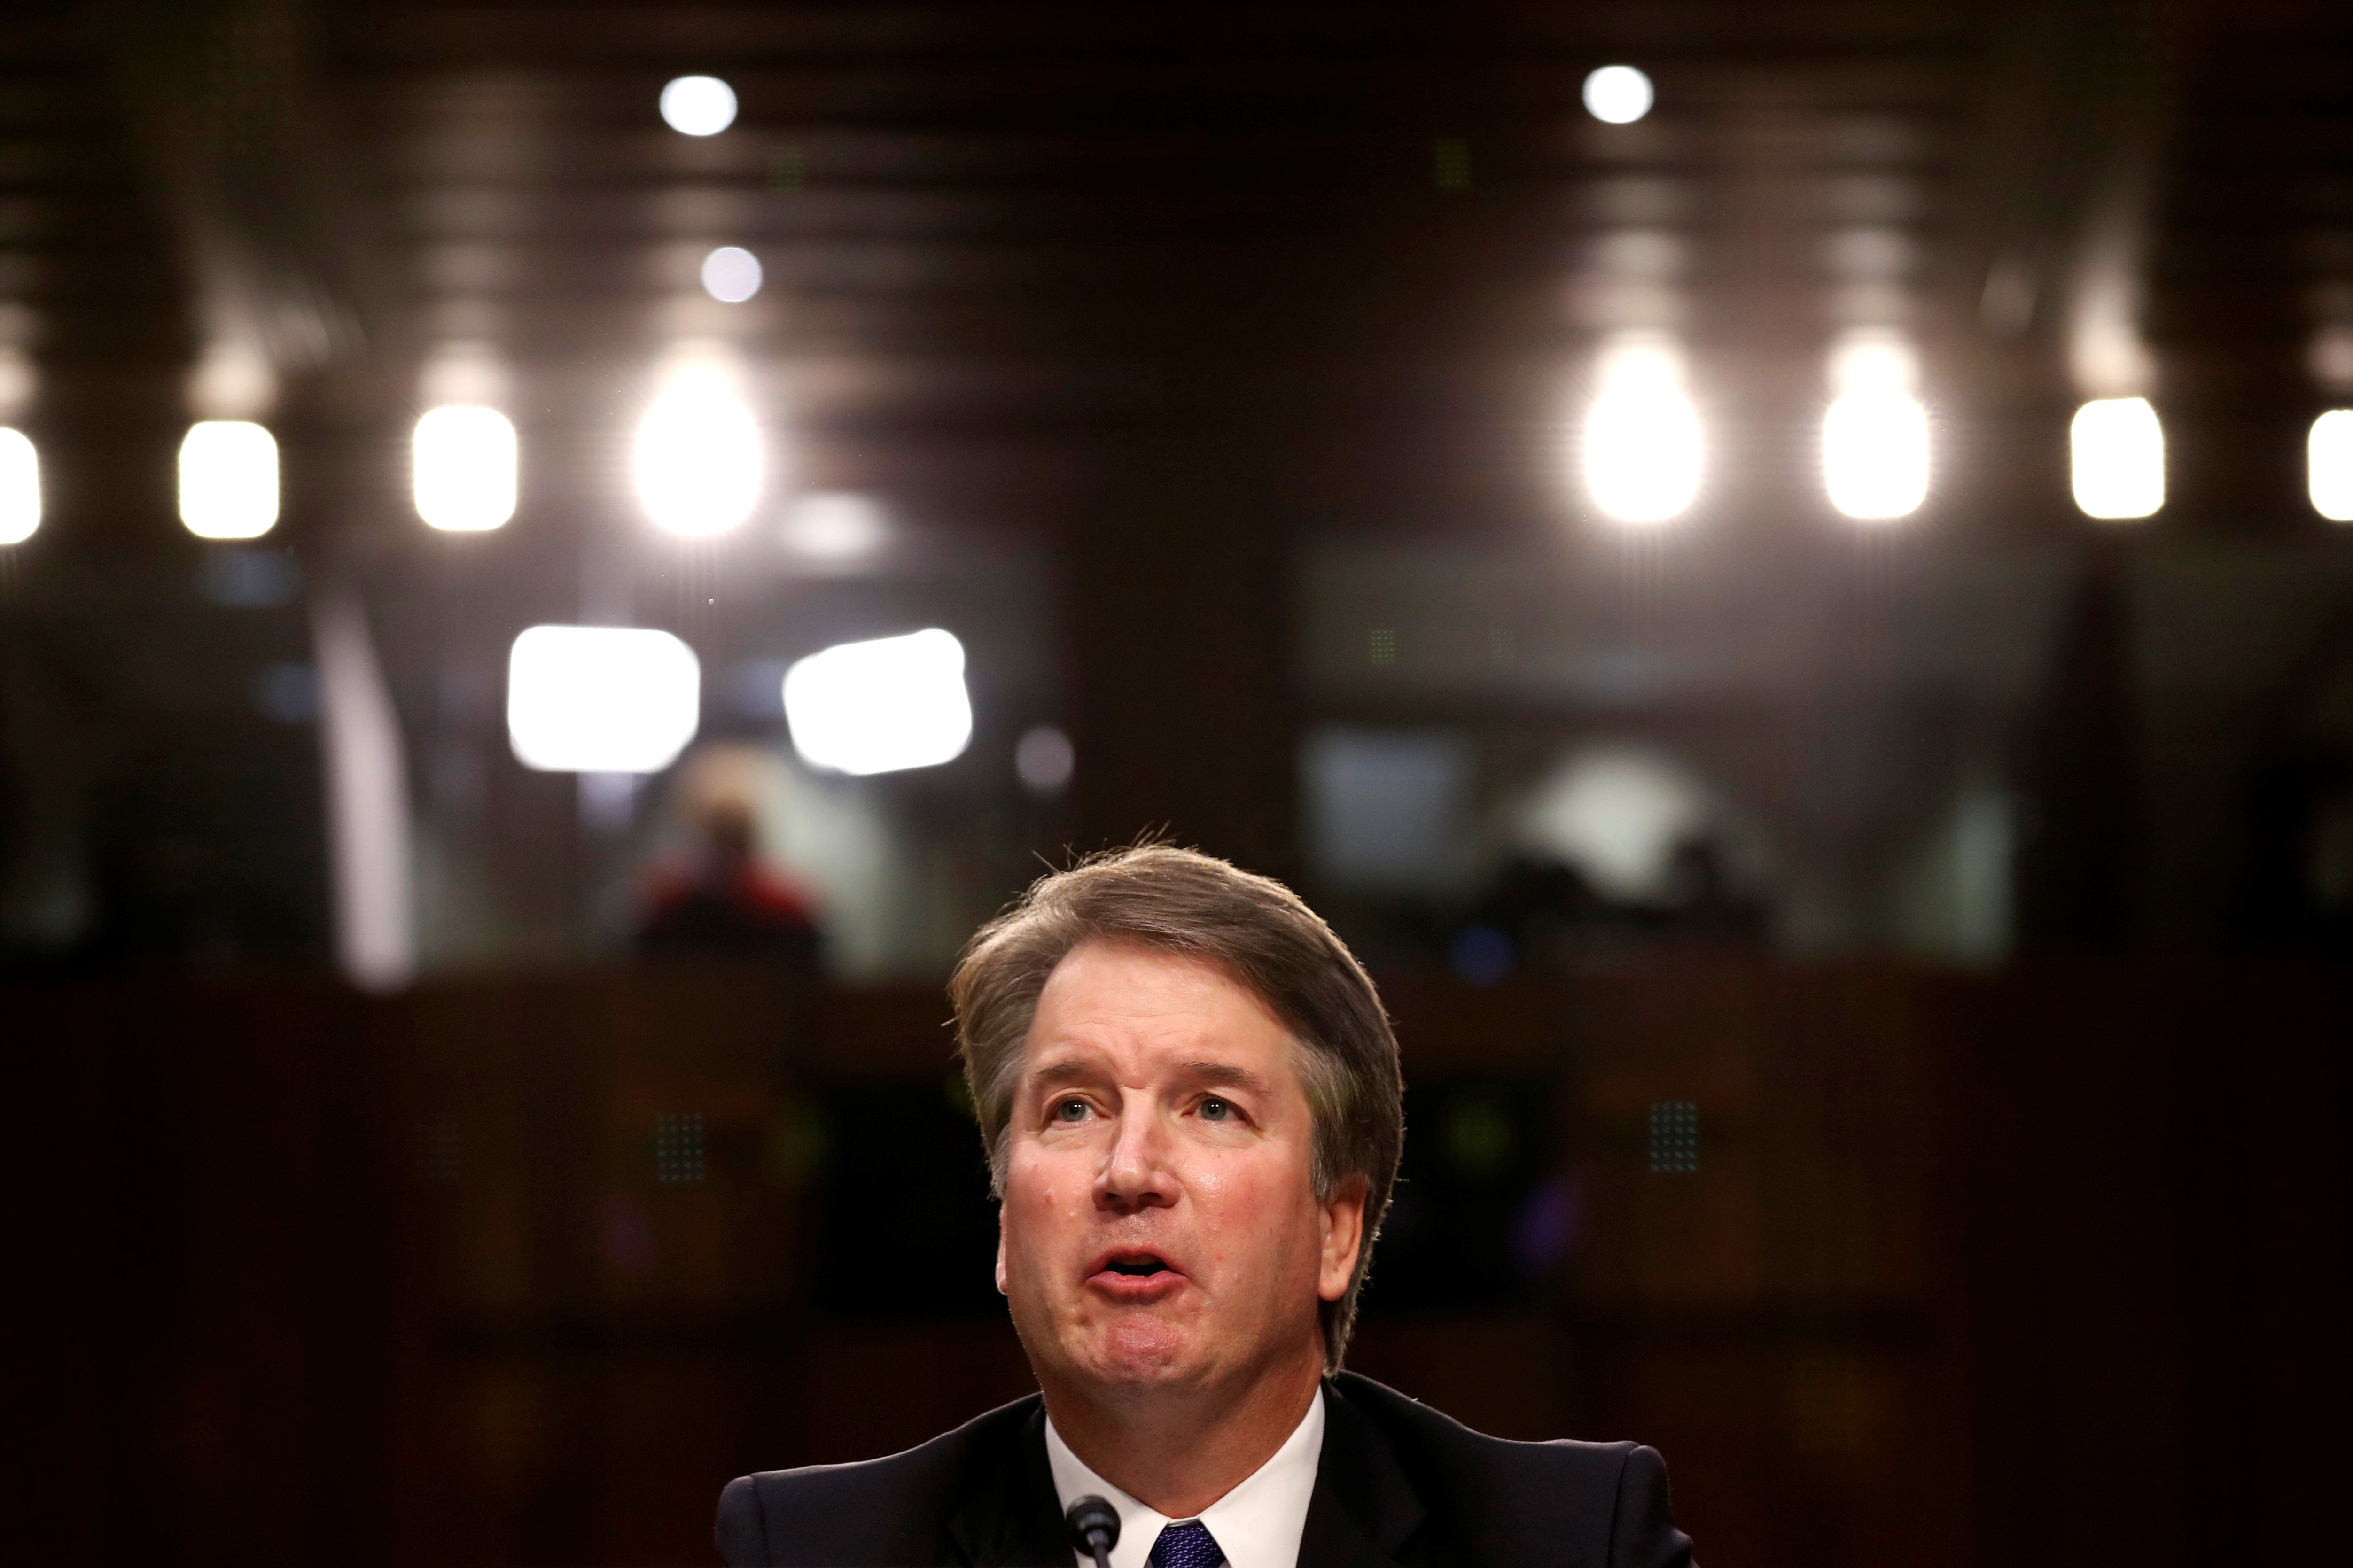 U.S. Supreme Court nominee judge Brett Kavanaugh speaks during a Senate Judiciary Committee confirmation hearing on Capitol Hill in Washington, U.S., September 4, 2018. REUTERS/Joshua Roberts